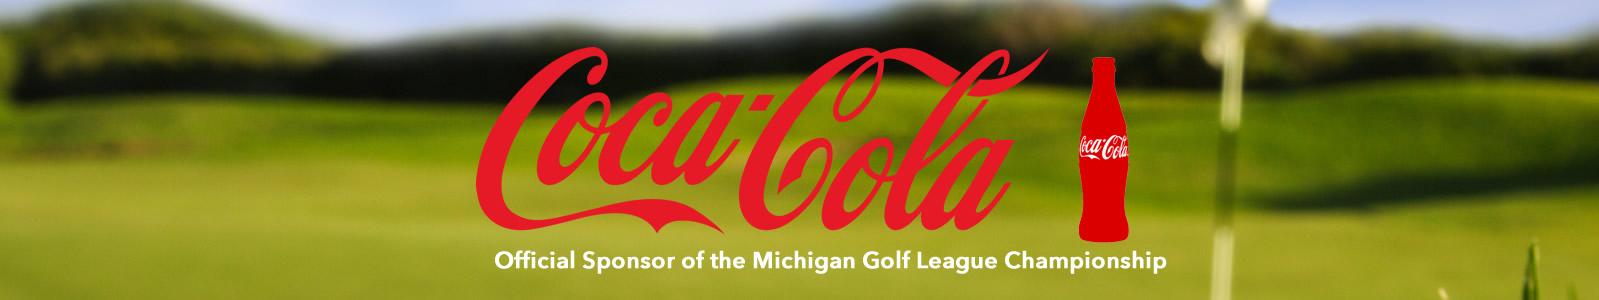 Coke Banner Ad